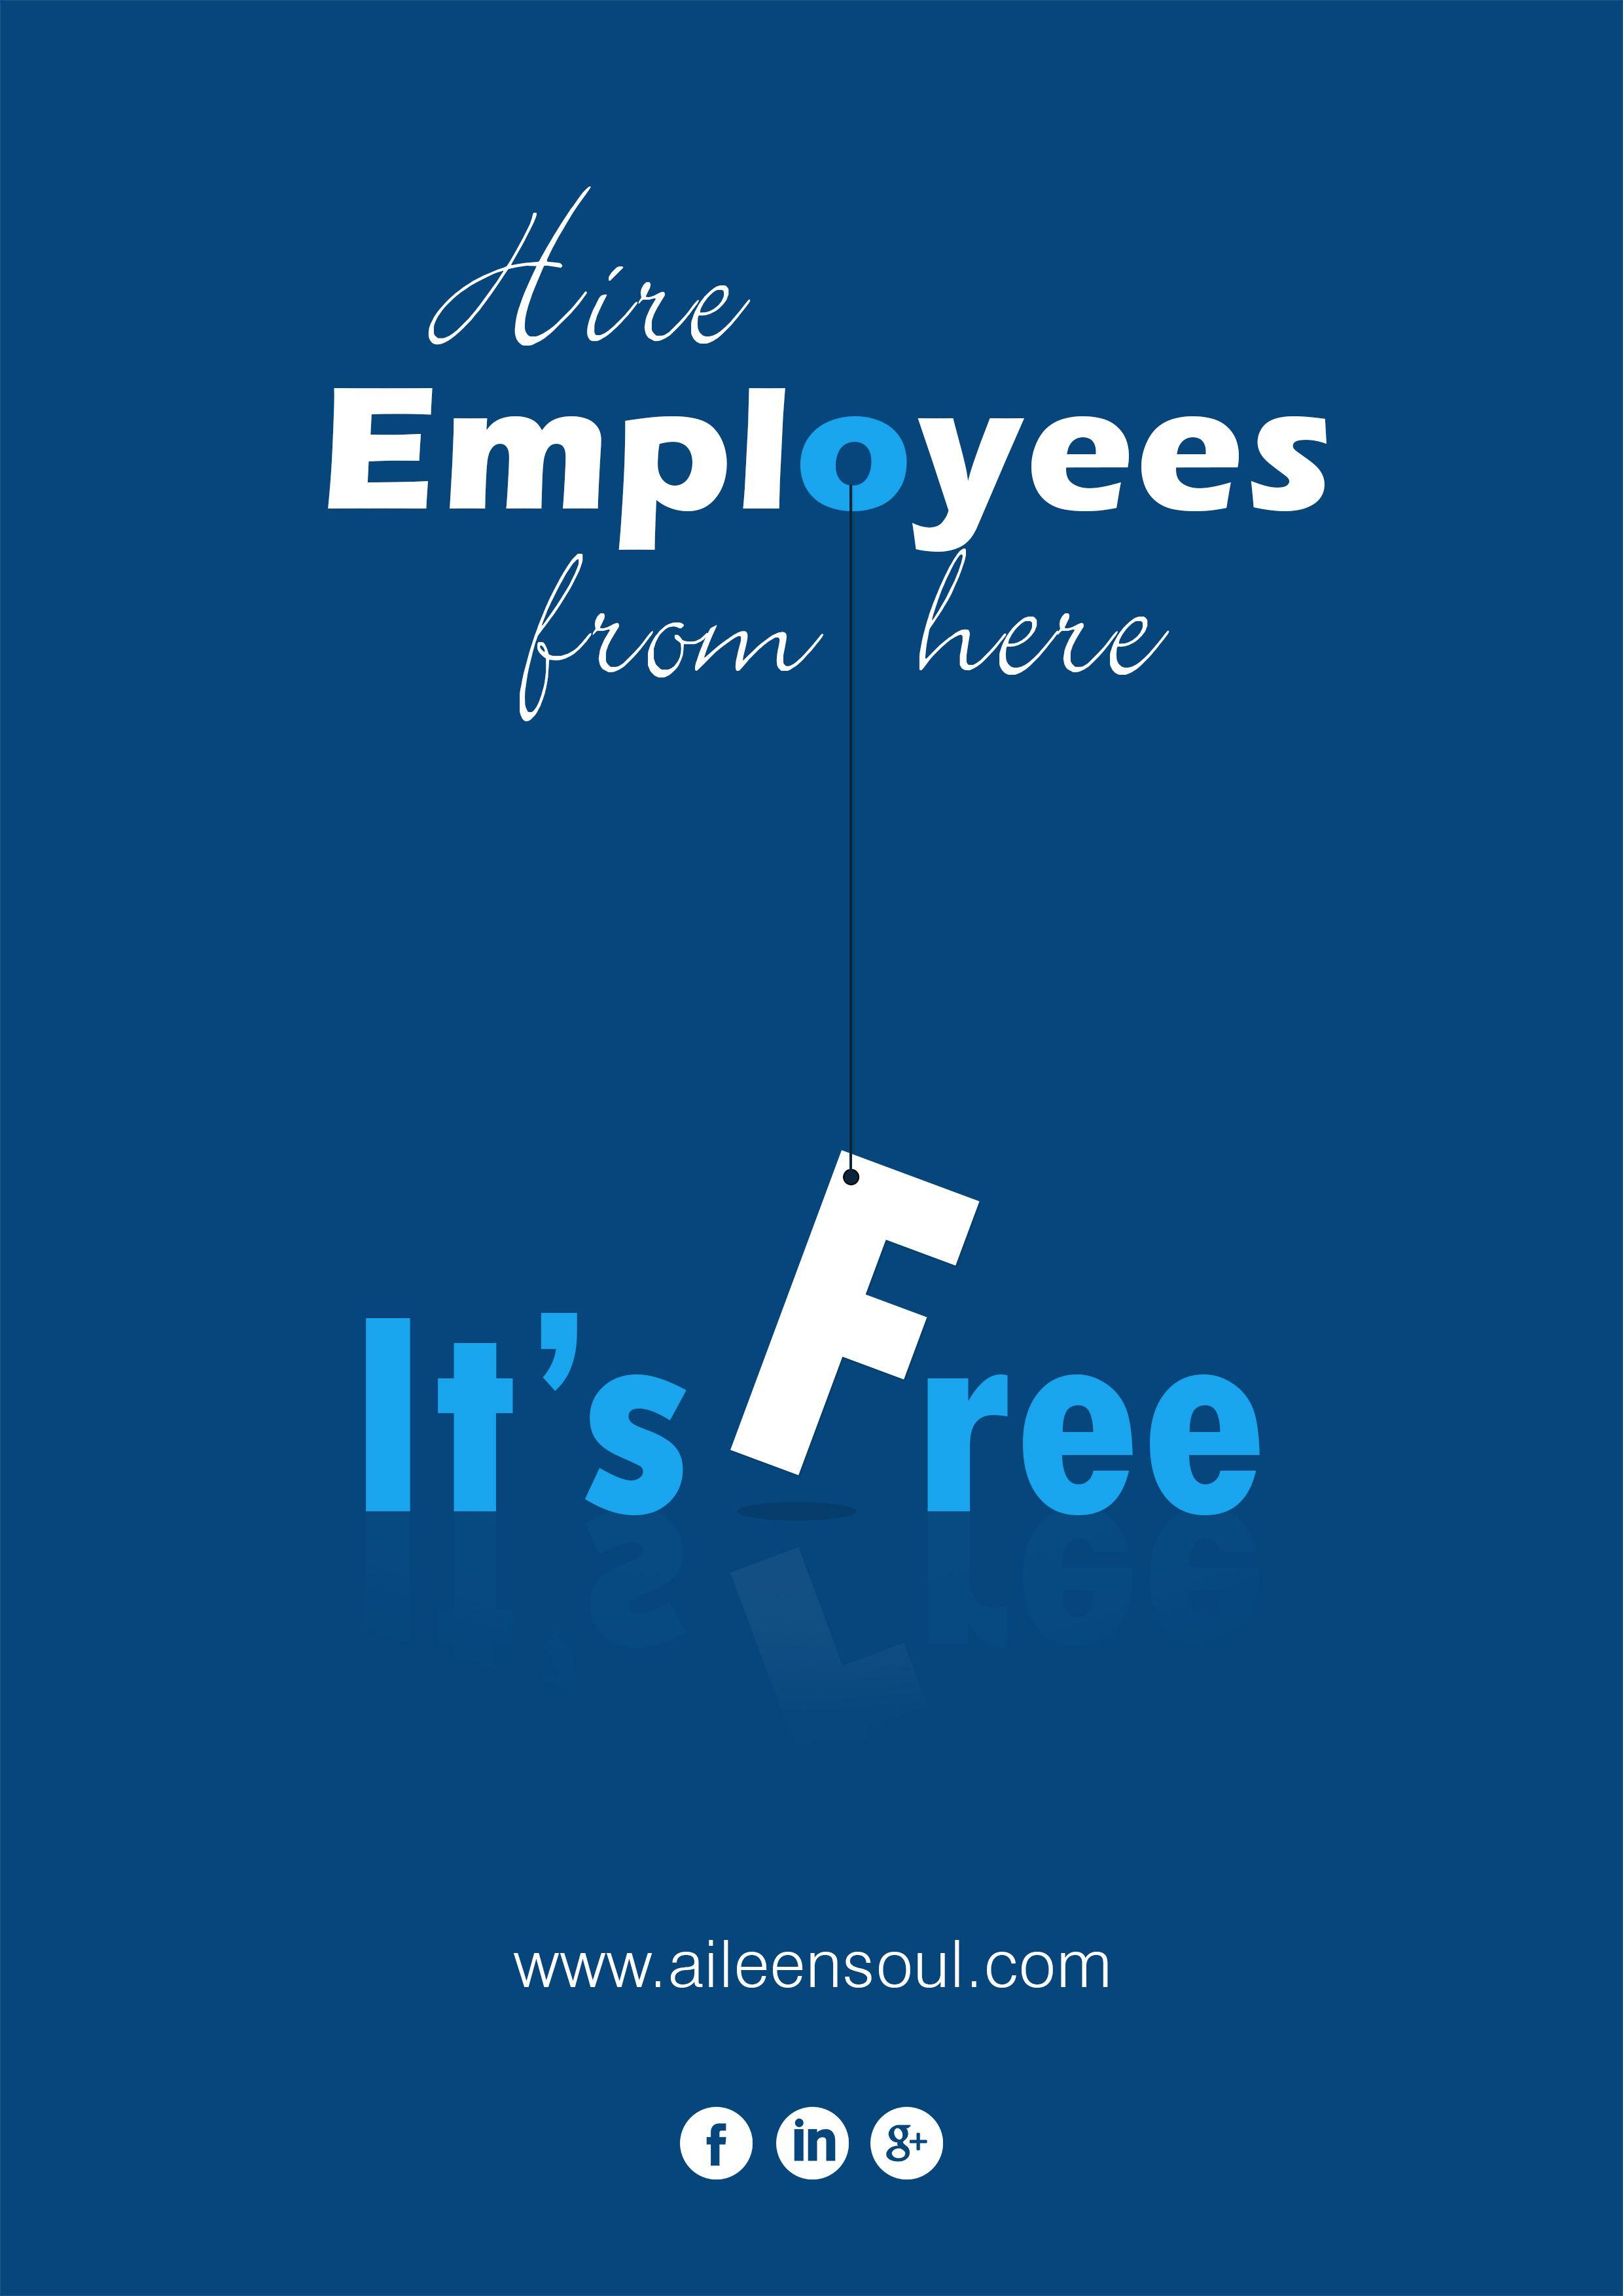 Hello Recruiters, We are Providing a Free Platform where